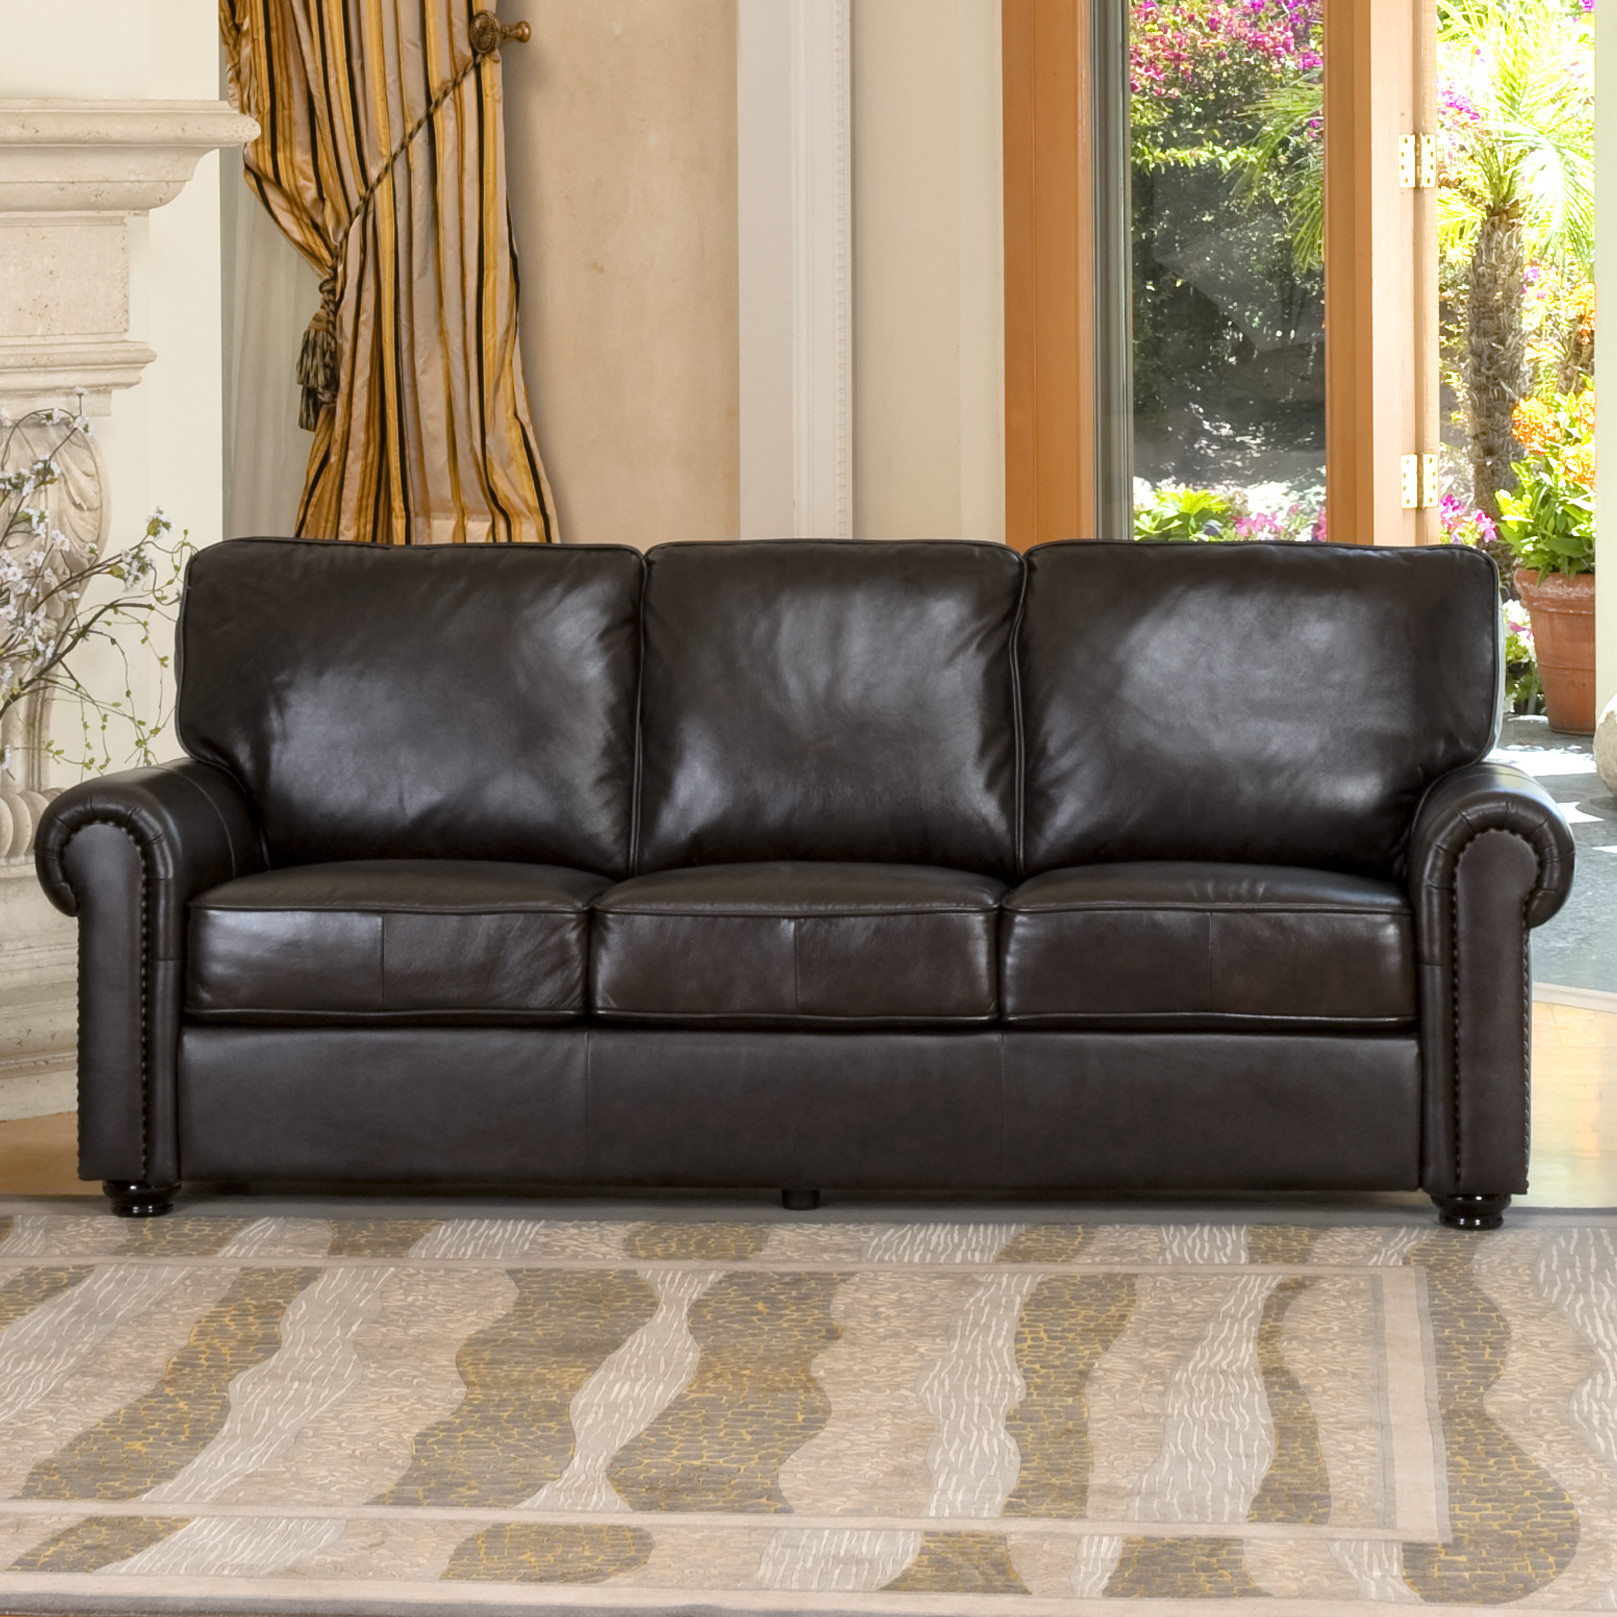 Abbyson-Living-Bliss-Leather-Sofa